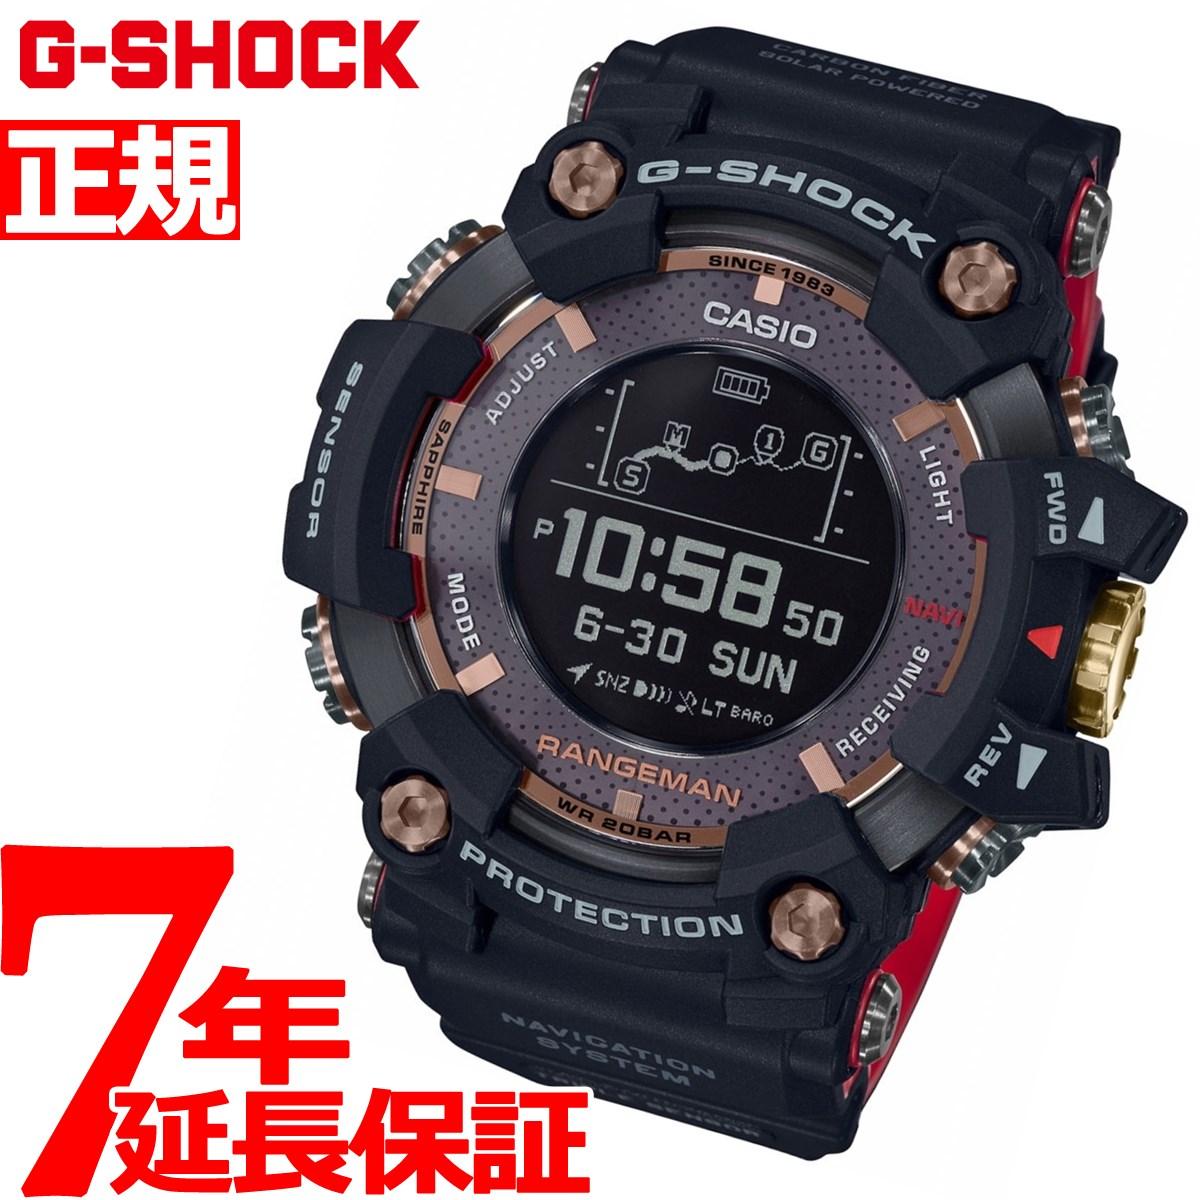 G-SHOCK レンジマン カシオ Gショック RANGEMAN Bluetooth搭載 GPS ソーラー 腕時計 メンズ GPR-B1000TF-1JR【2018 新作】